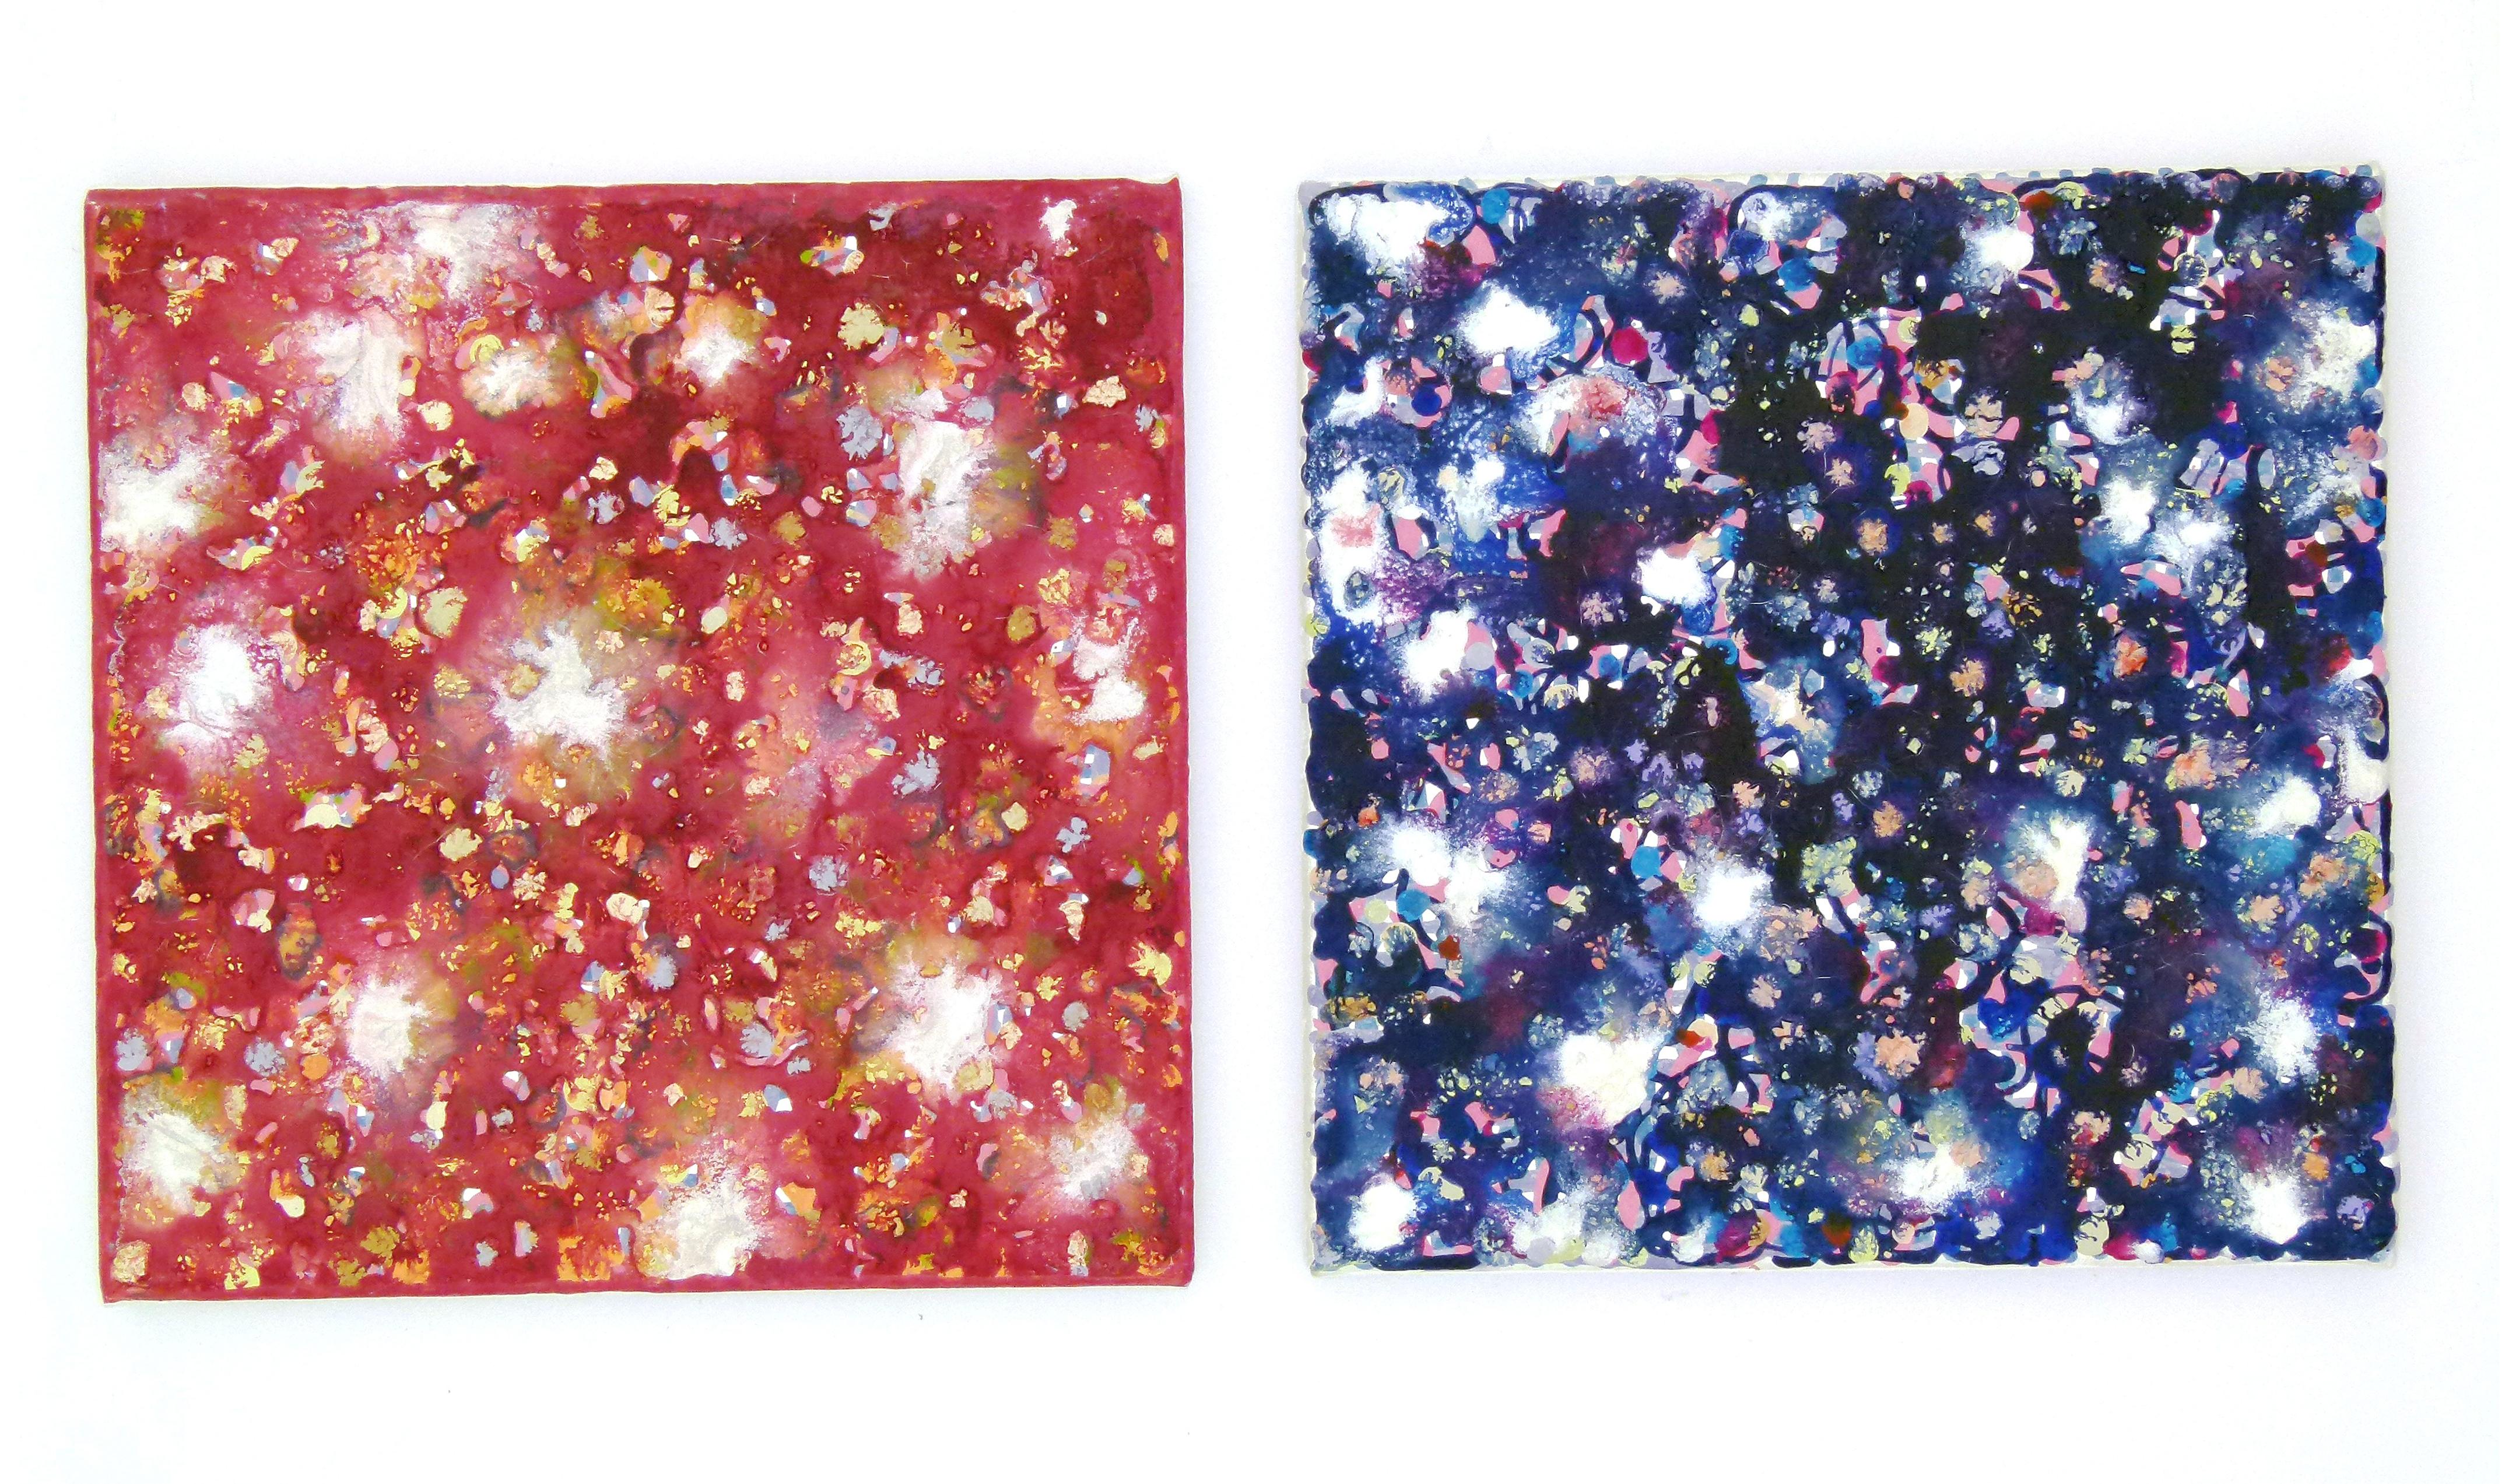 Farbige Tusche auf Leinwand 2007_0004_L1100040a